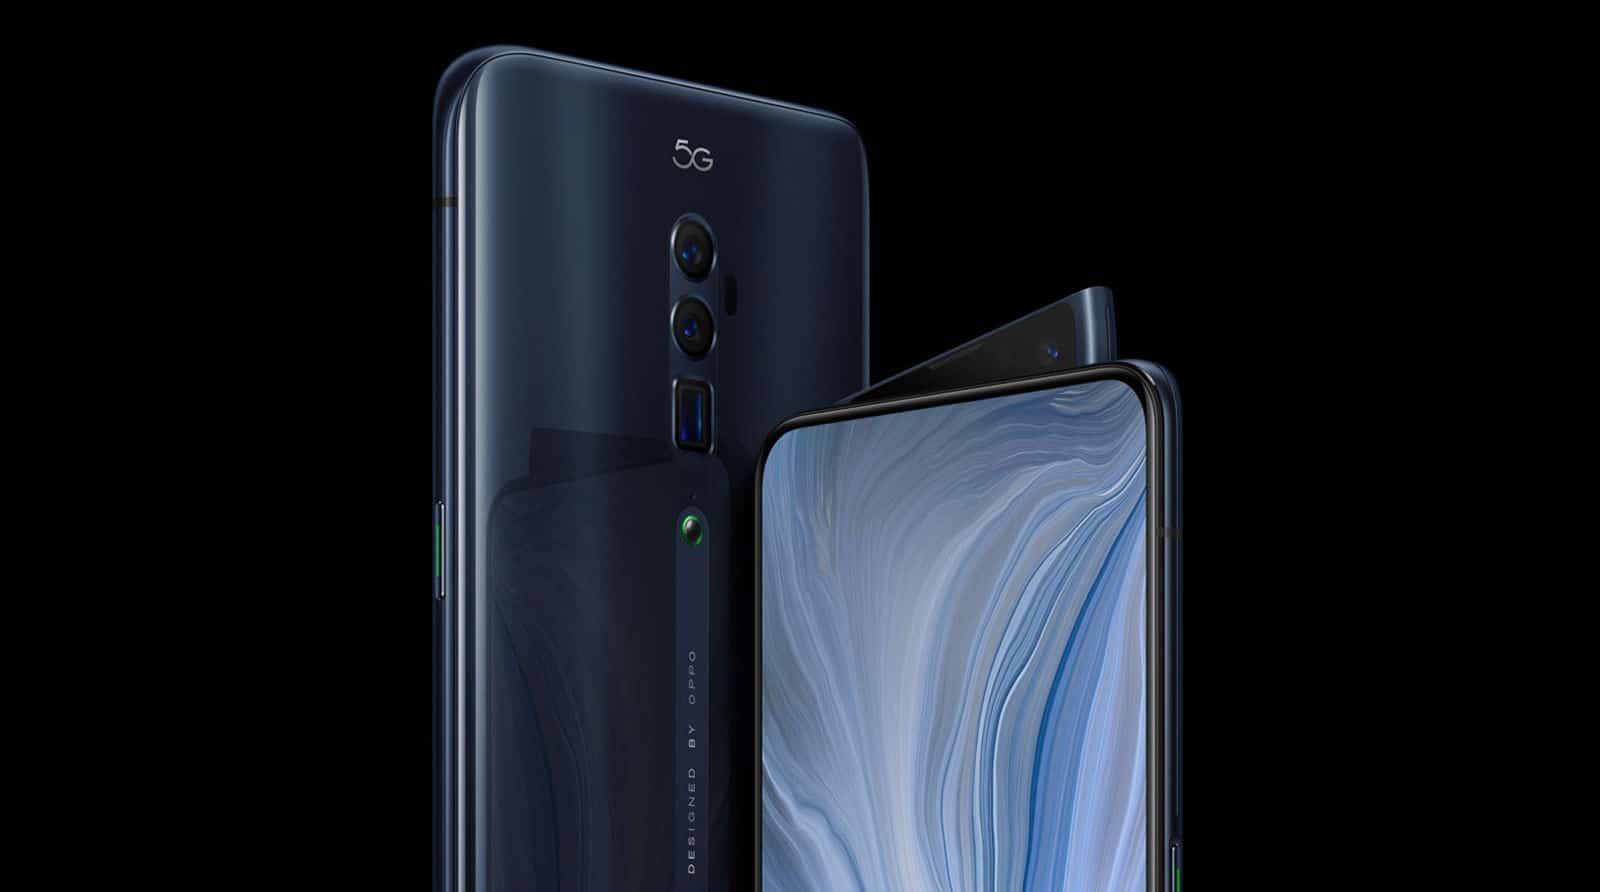 Oppo Reno 5G-Smartphone mit super Kamera